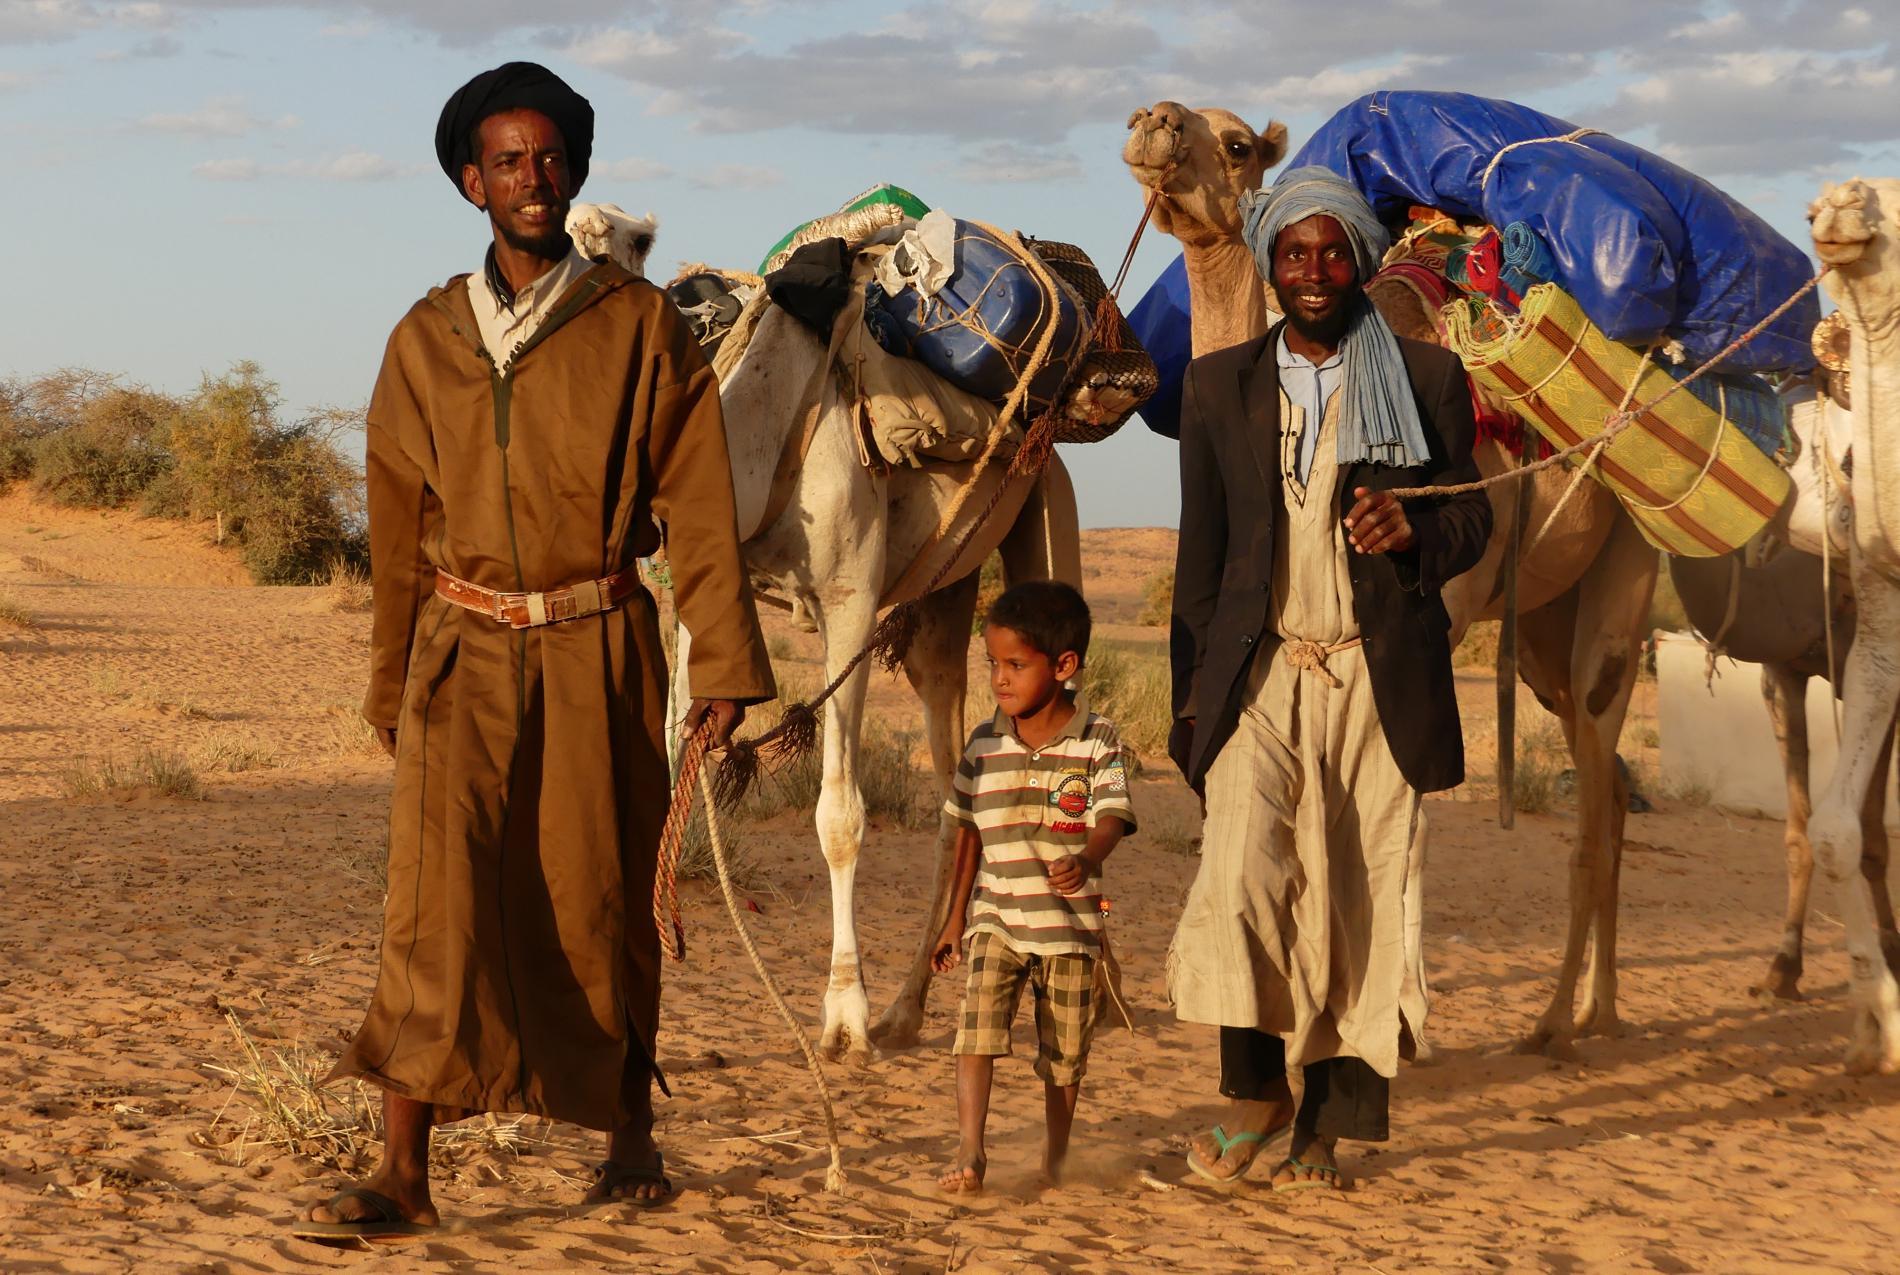 Mauritanie : Nos voyages solidaires